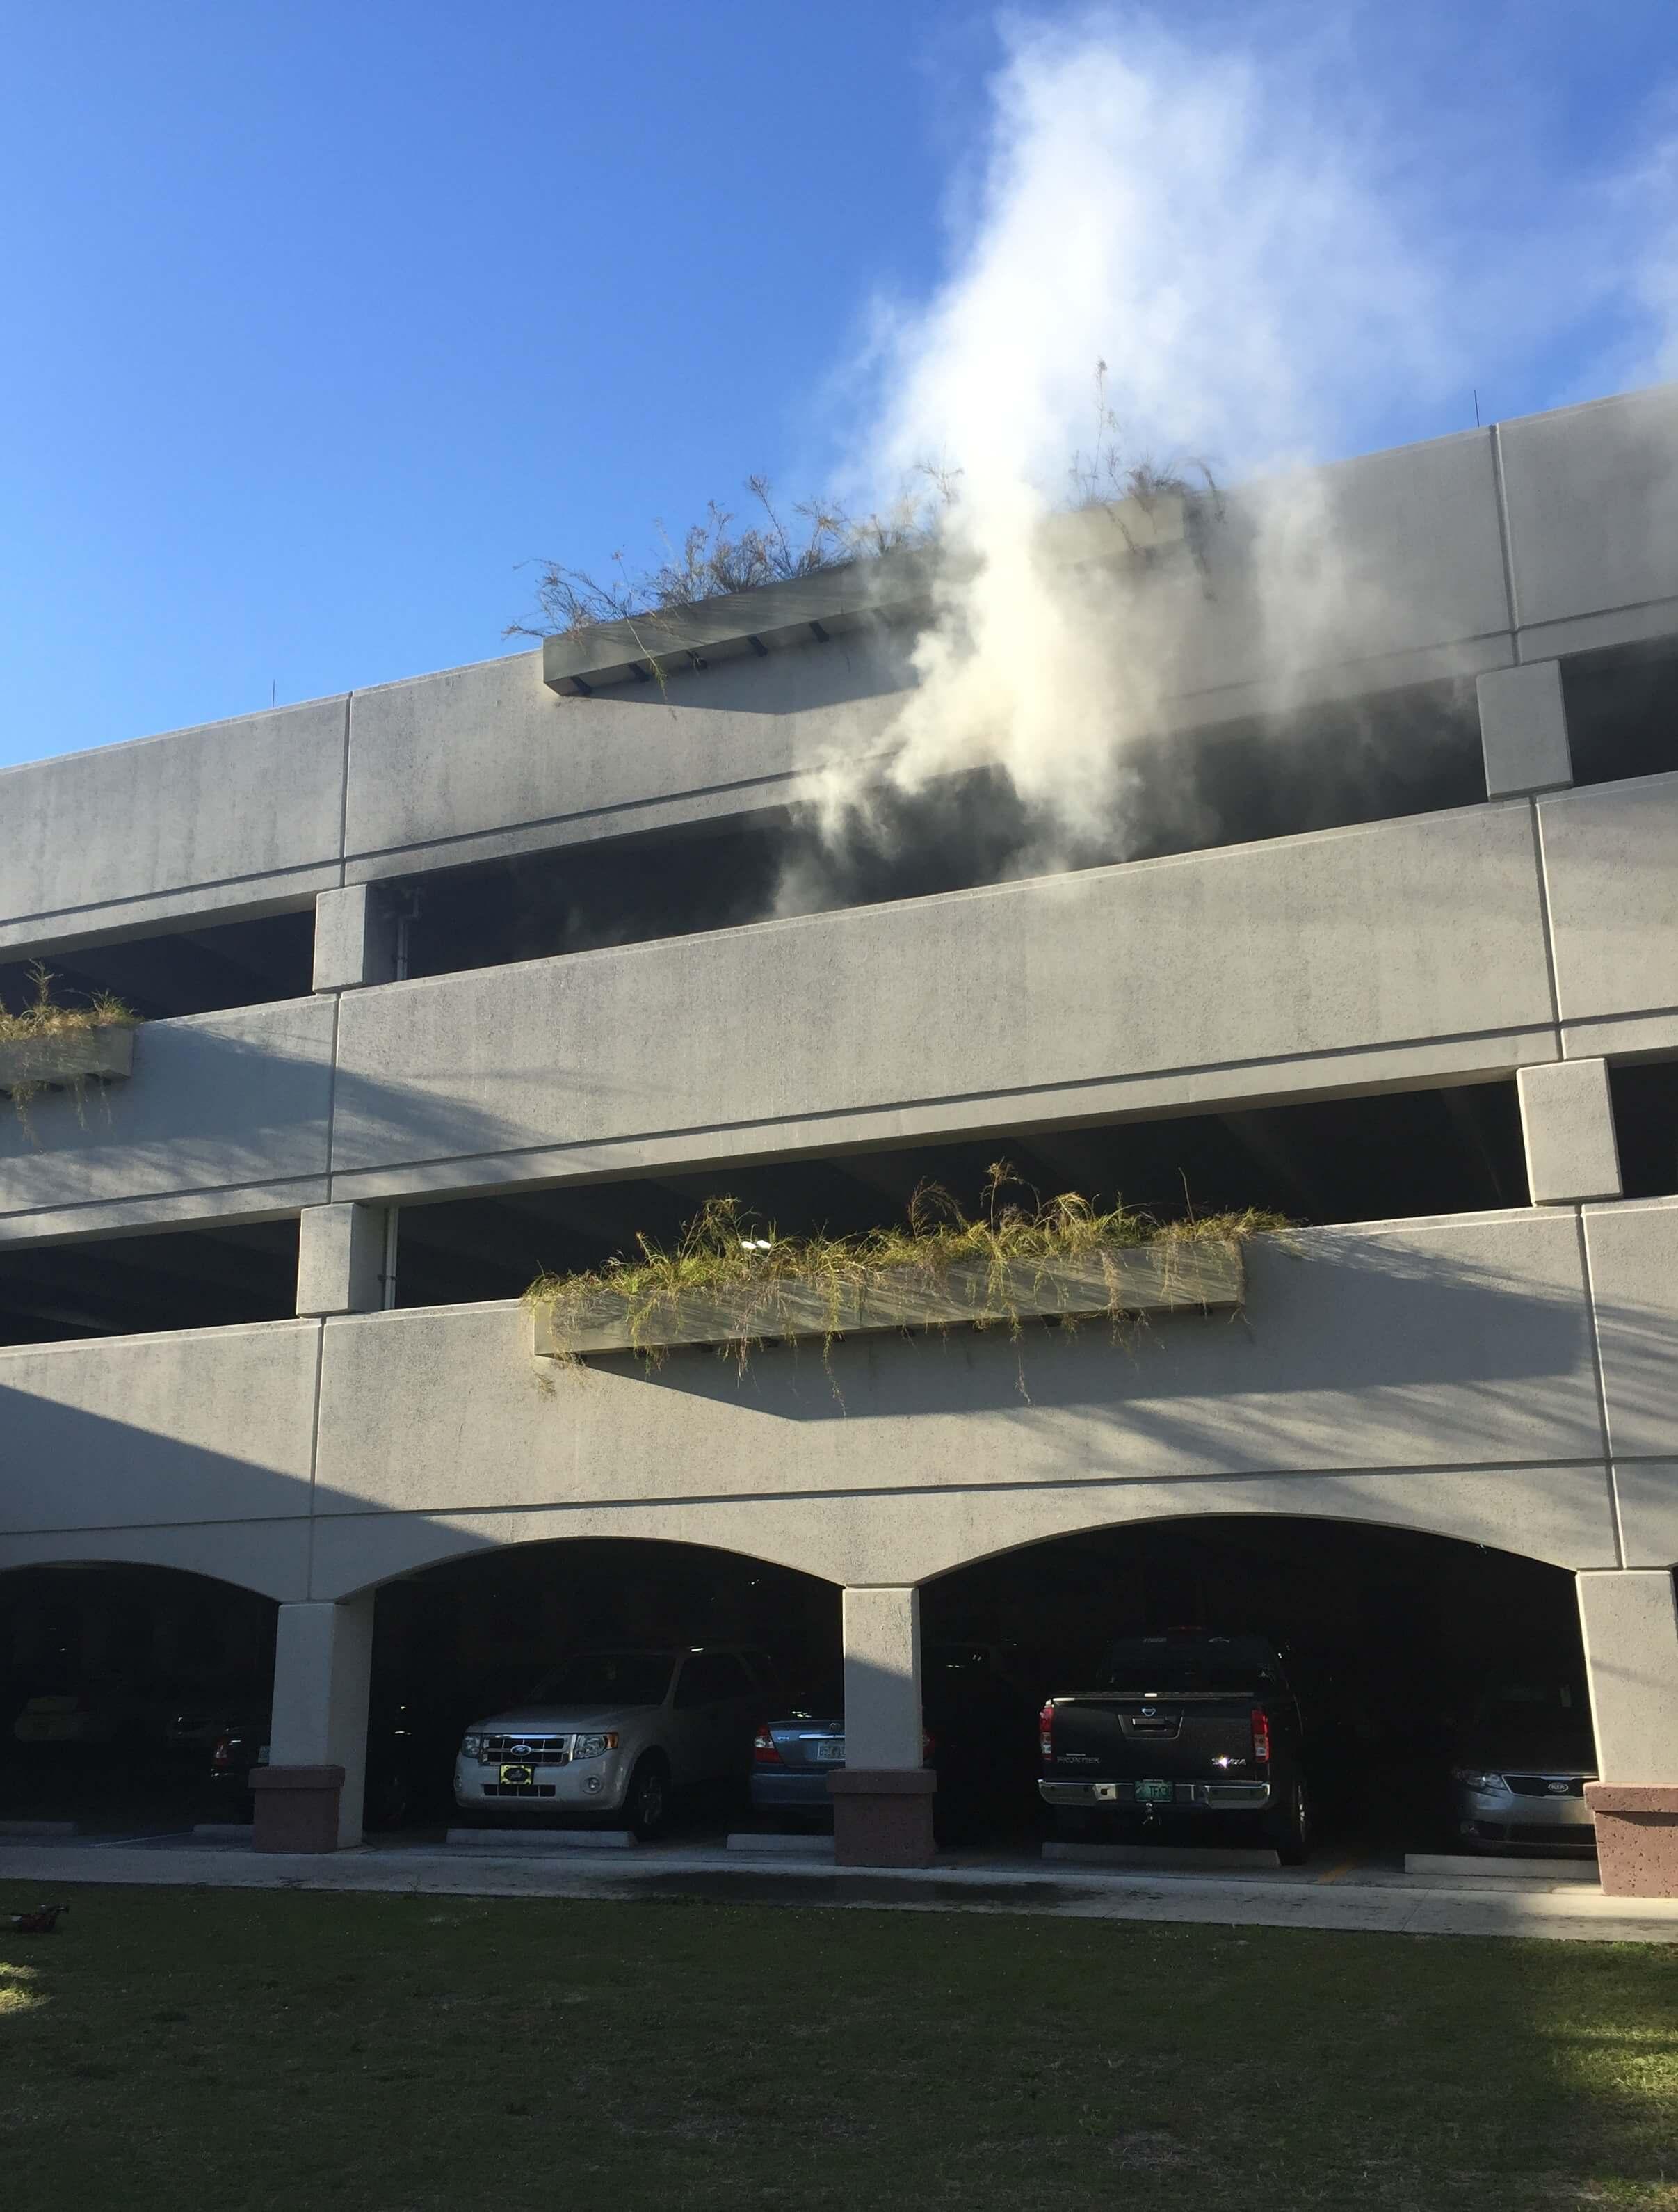 Smoke Parking Garage : Vehicle fire breaks out in fgcu parking garage